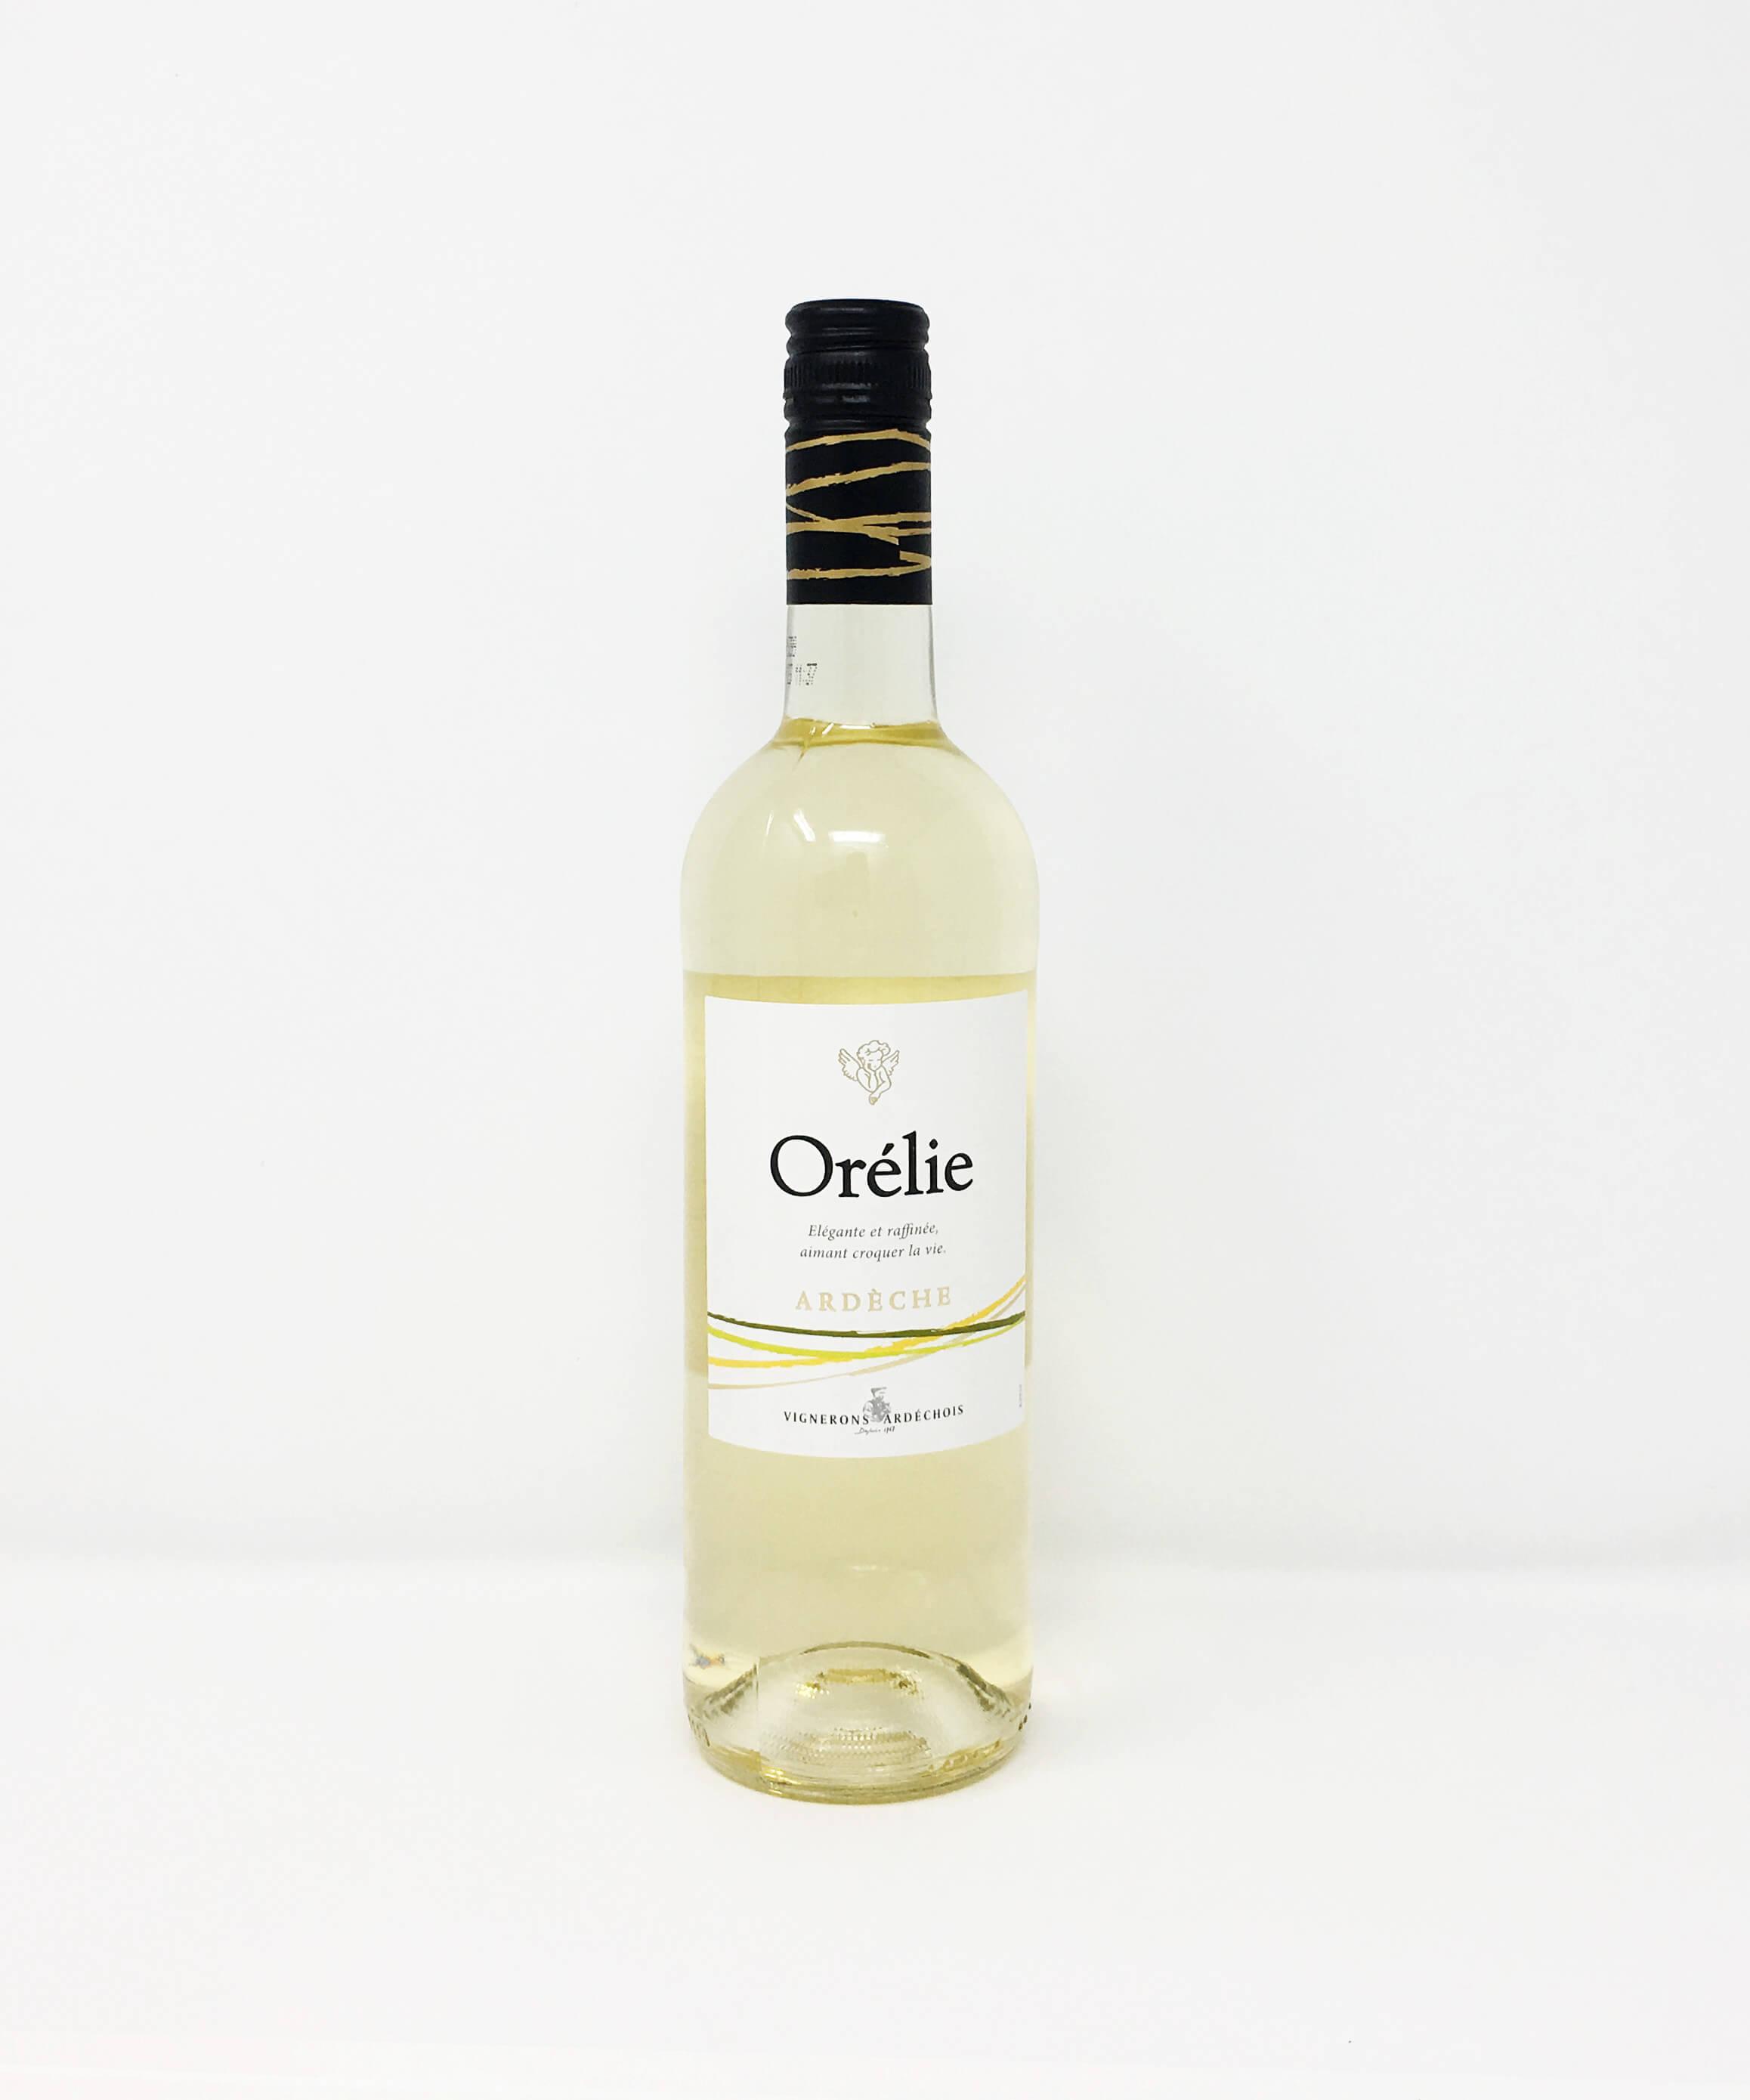 Vignerons Ardechois, Orelie, Blanc